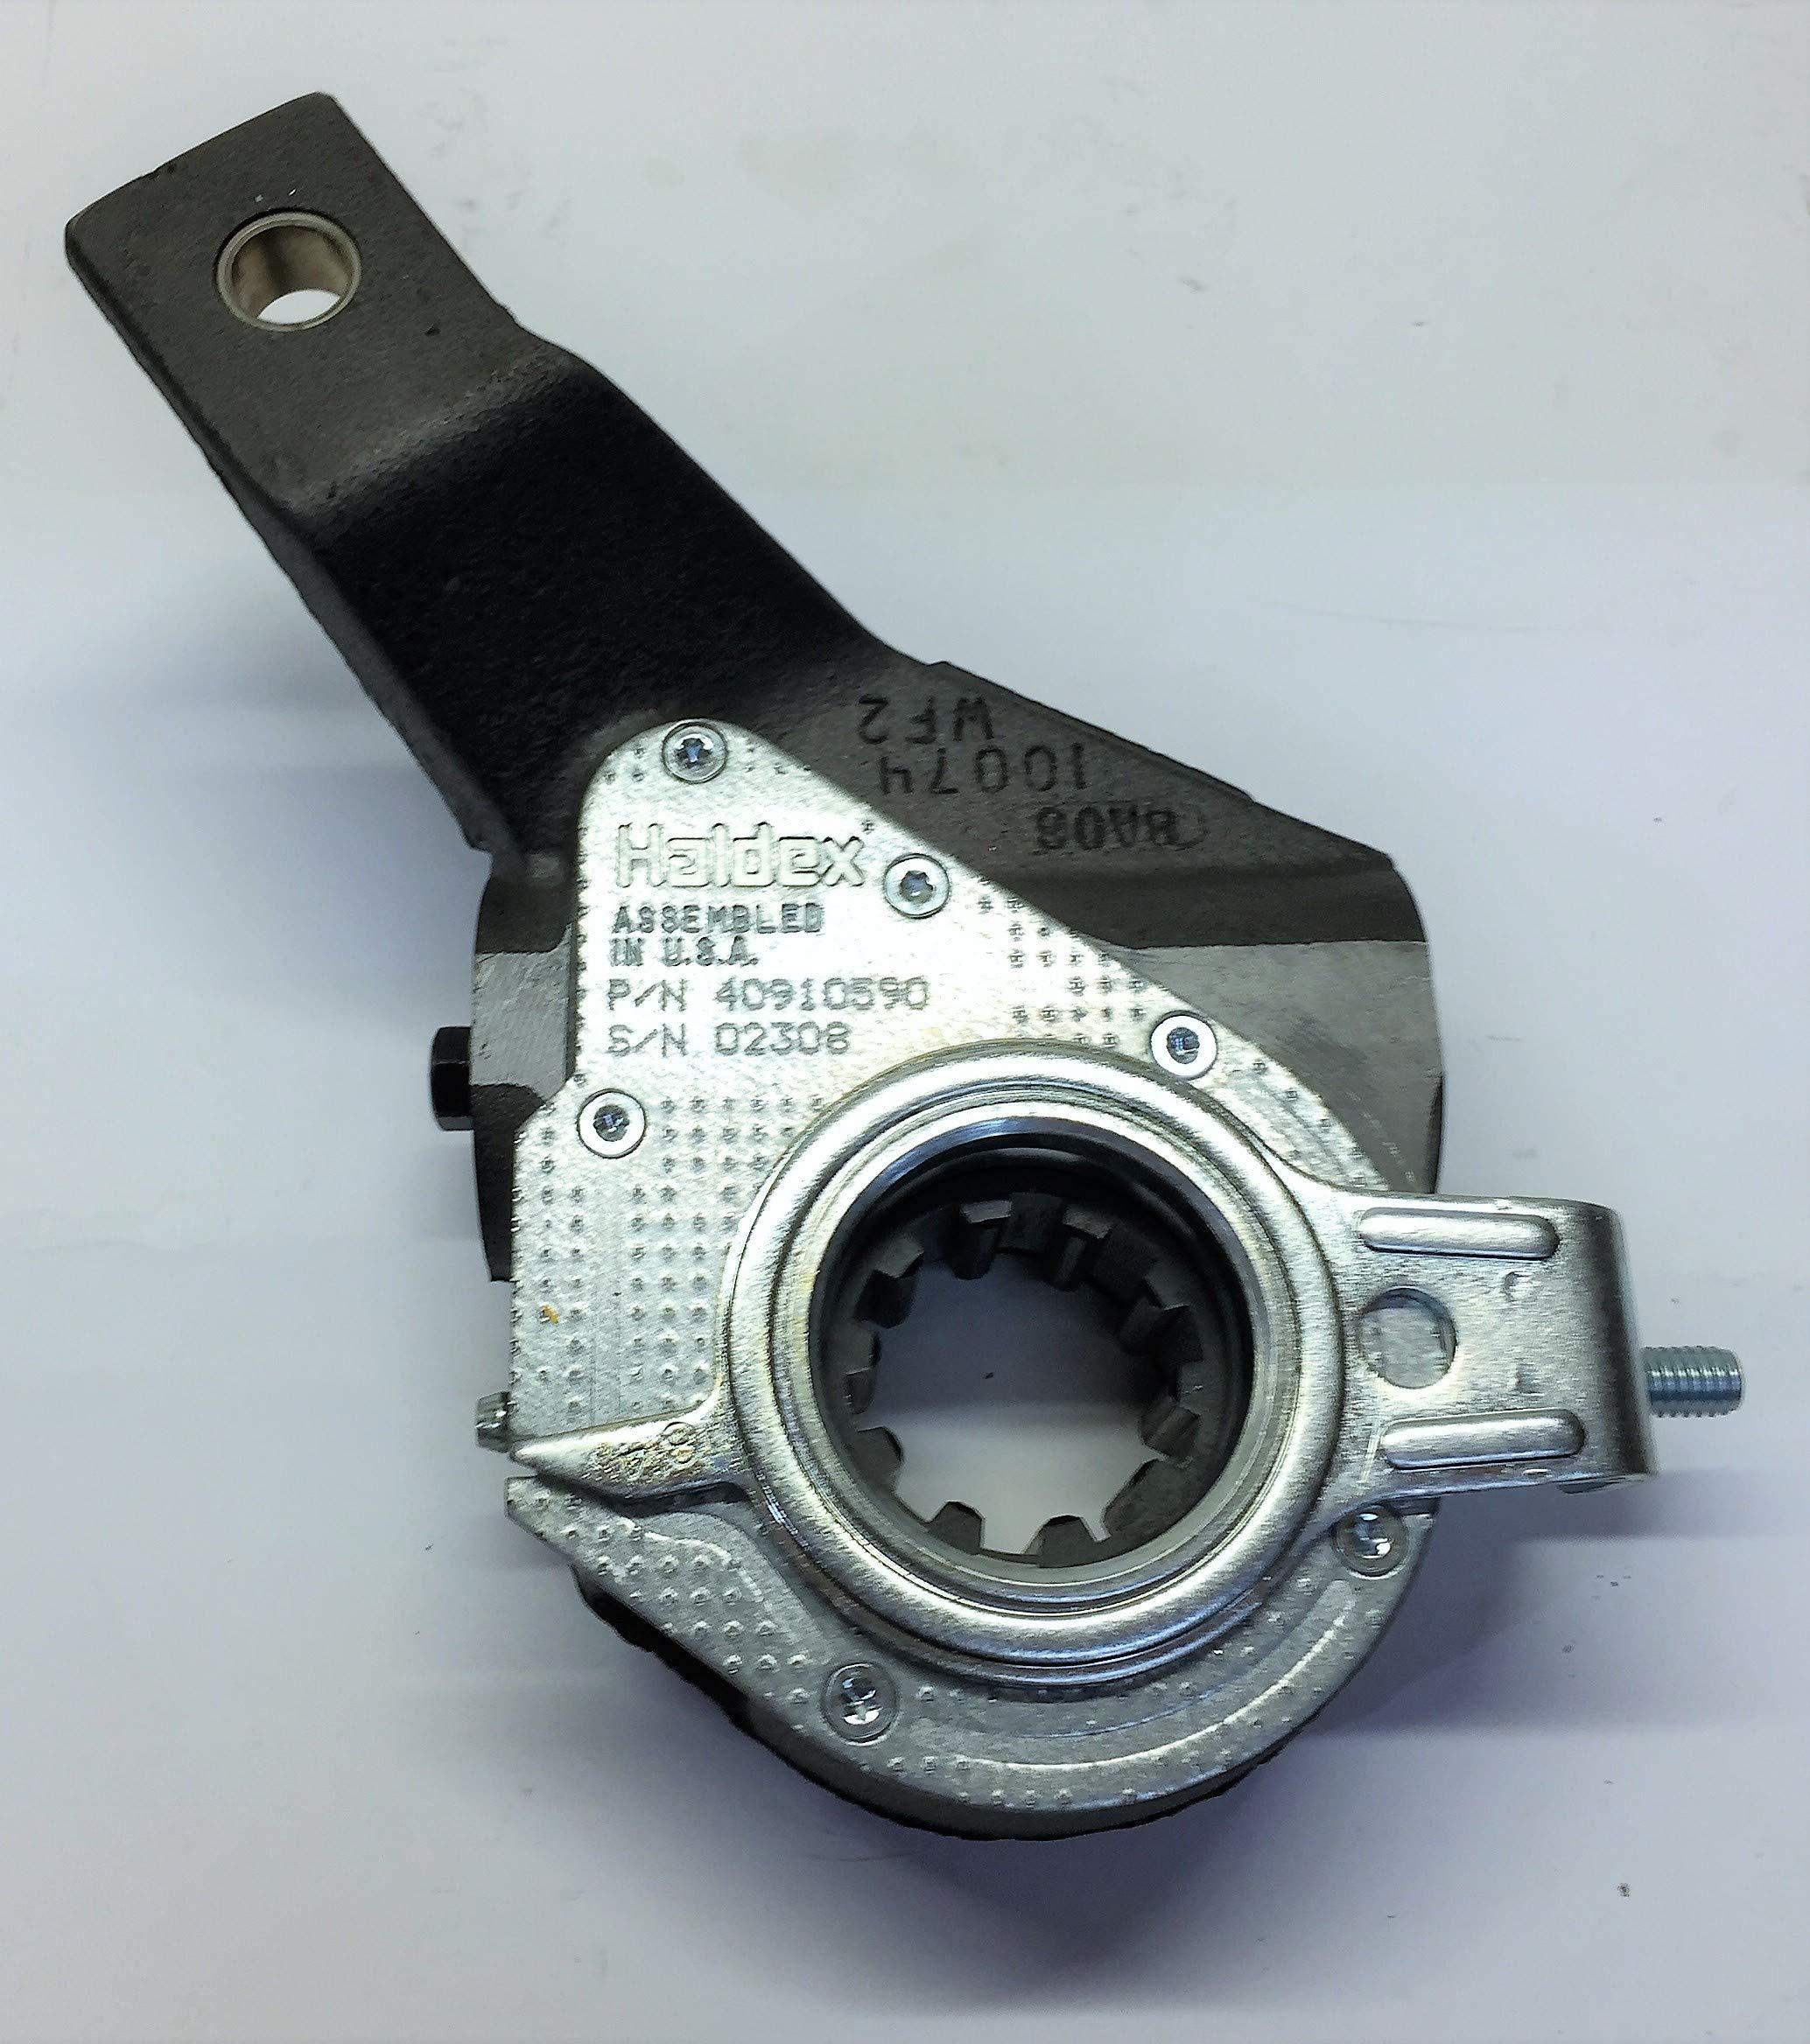 Haldex Automatic Brake Adjuster 409-10590 by Haldex (Image #2)